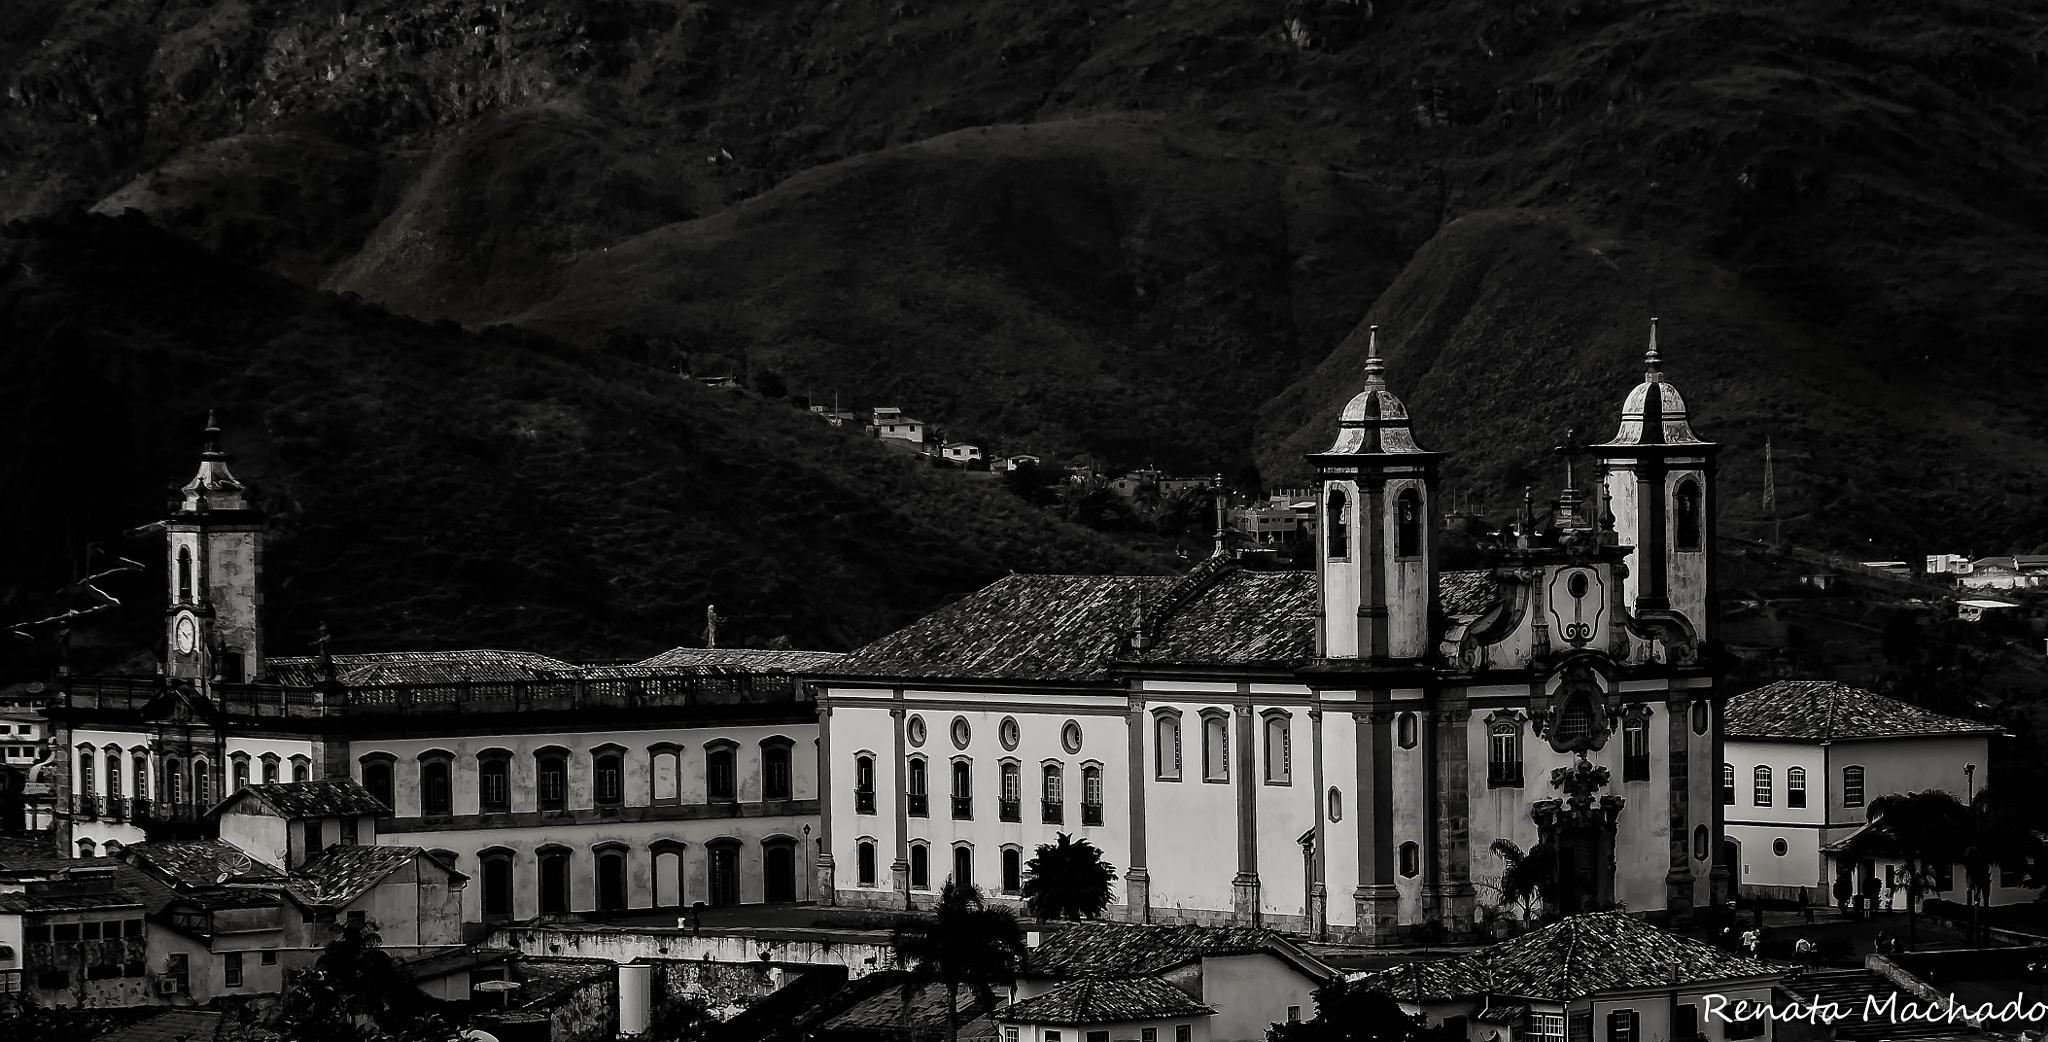 Church by renatamachado